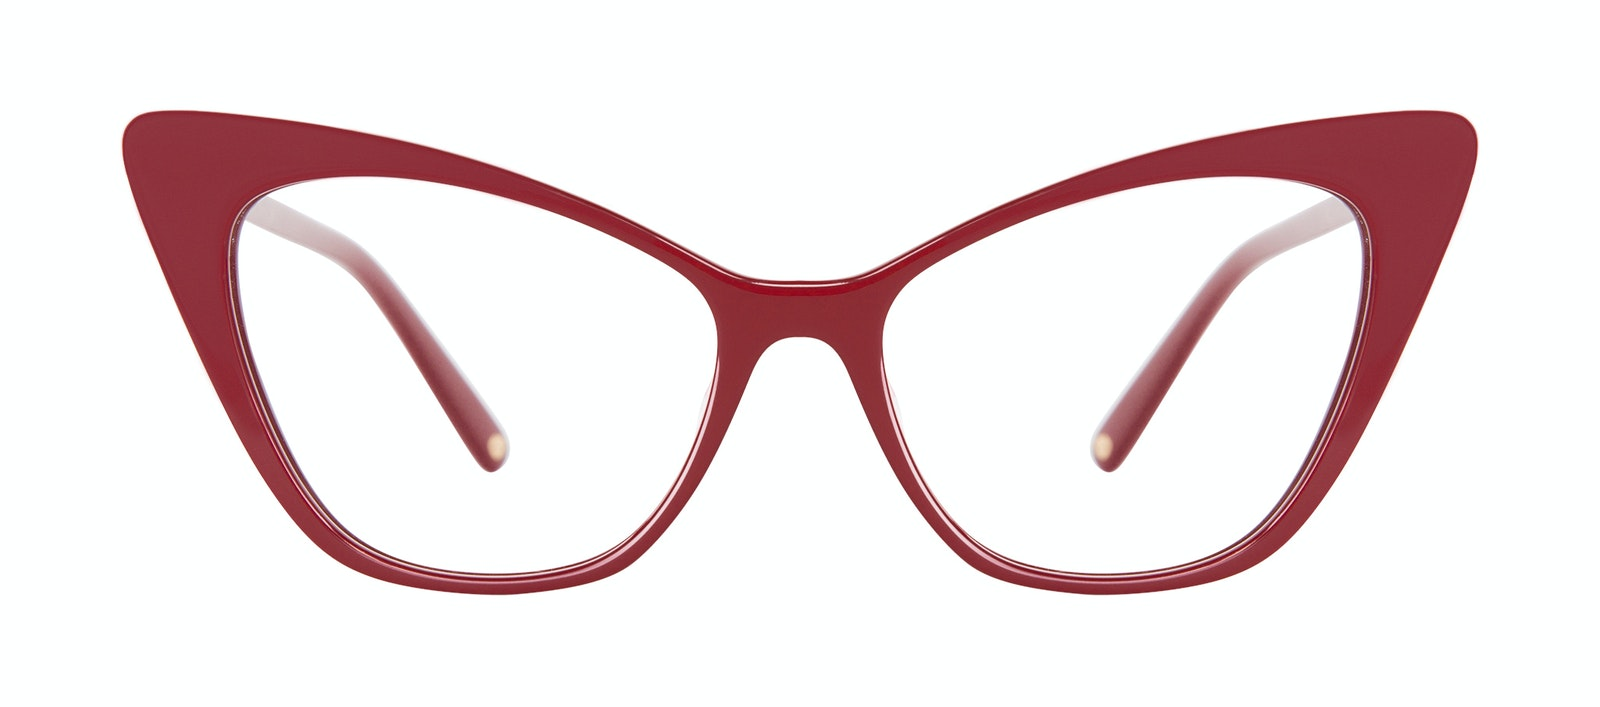 Affordable Fashion Glasses Cat Eye Eyeglasses Women Keiko Lynn Ryder Red Front